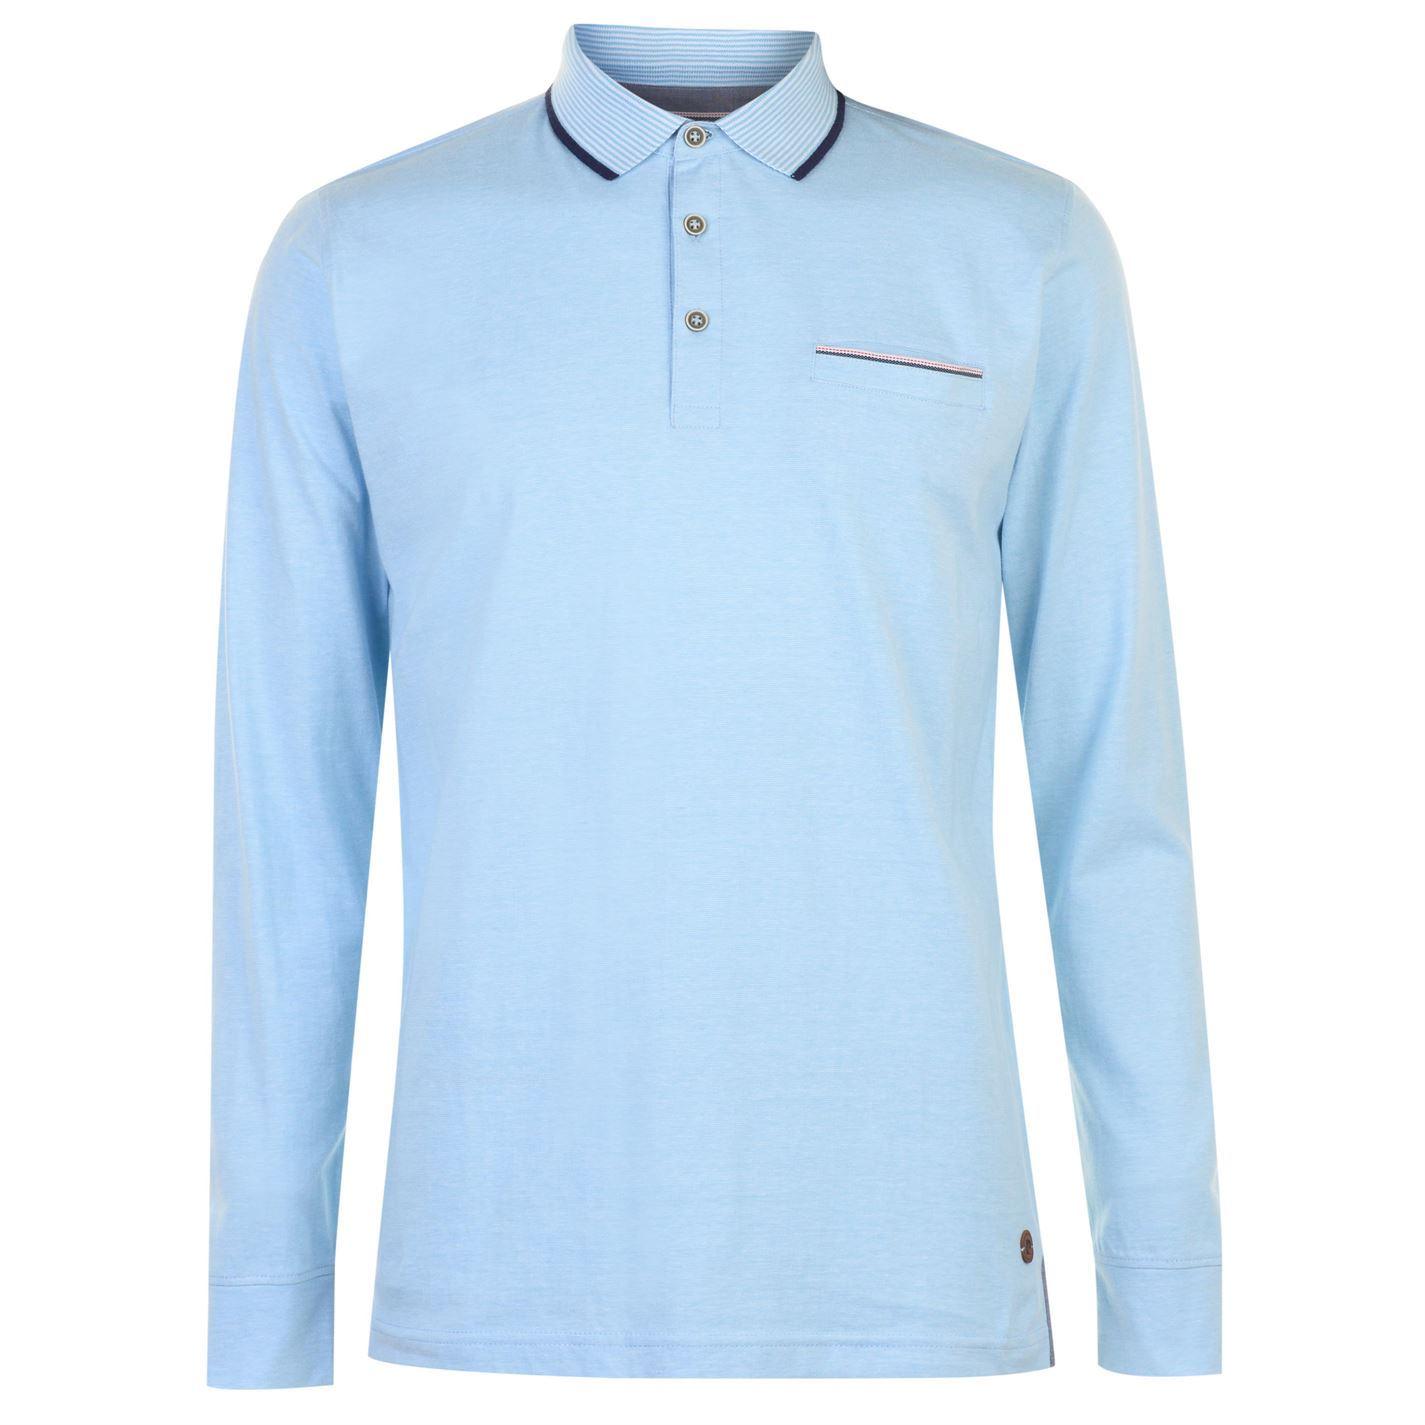 Pierre cardin mens long sleeve yarn dye polo shirt top for Men s lightweight long sleeve polo shirts